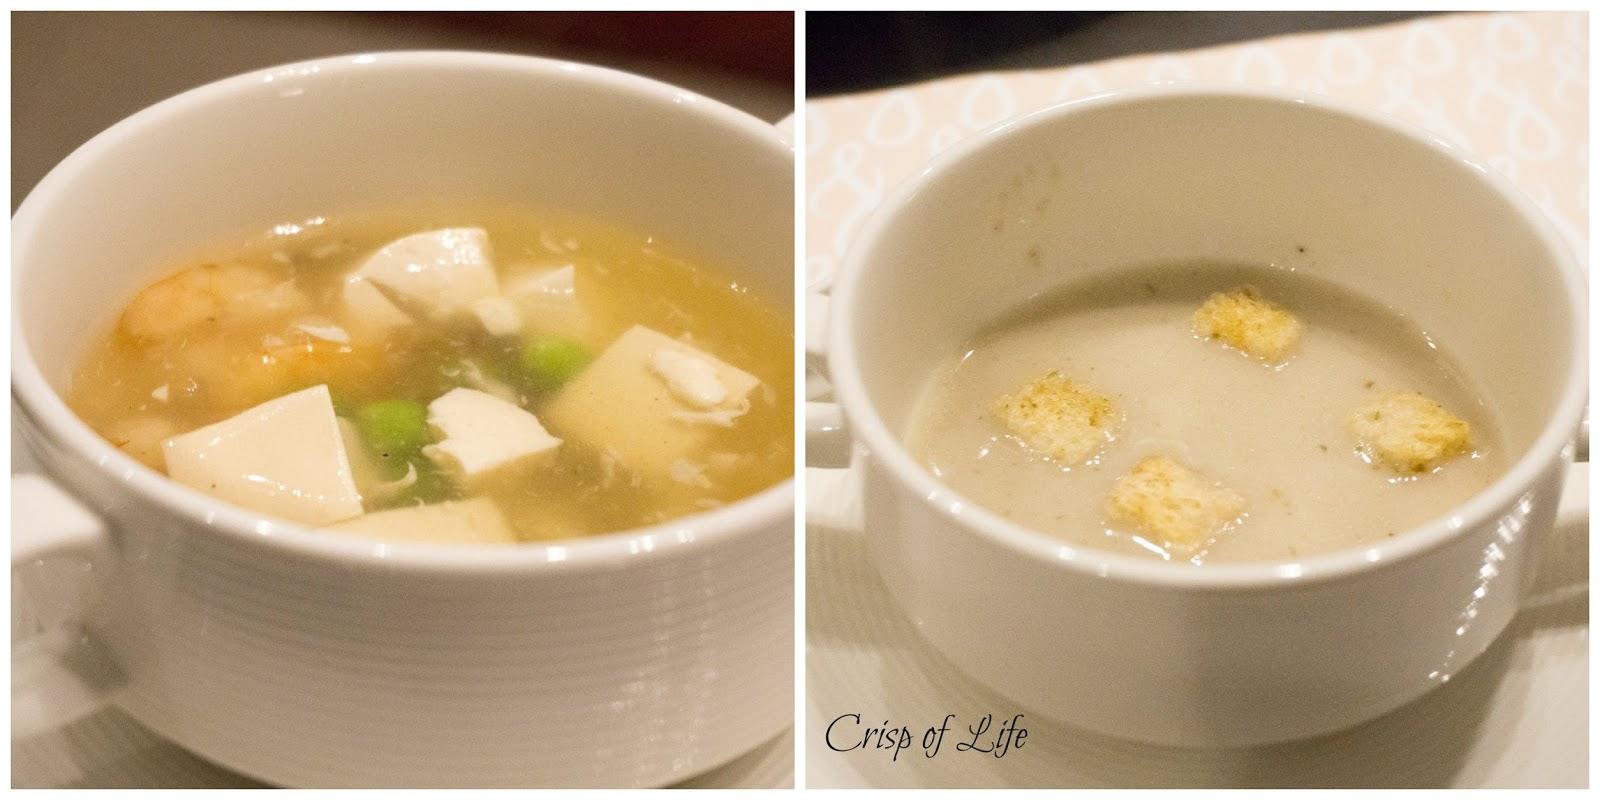 Seafood Dilight Dinner Buffet @ Nada Lama, Equotorial Hotel, Penang